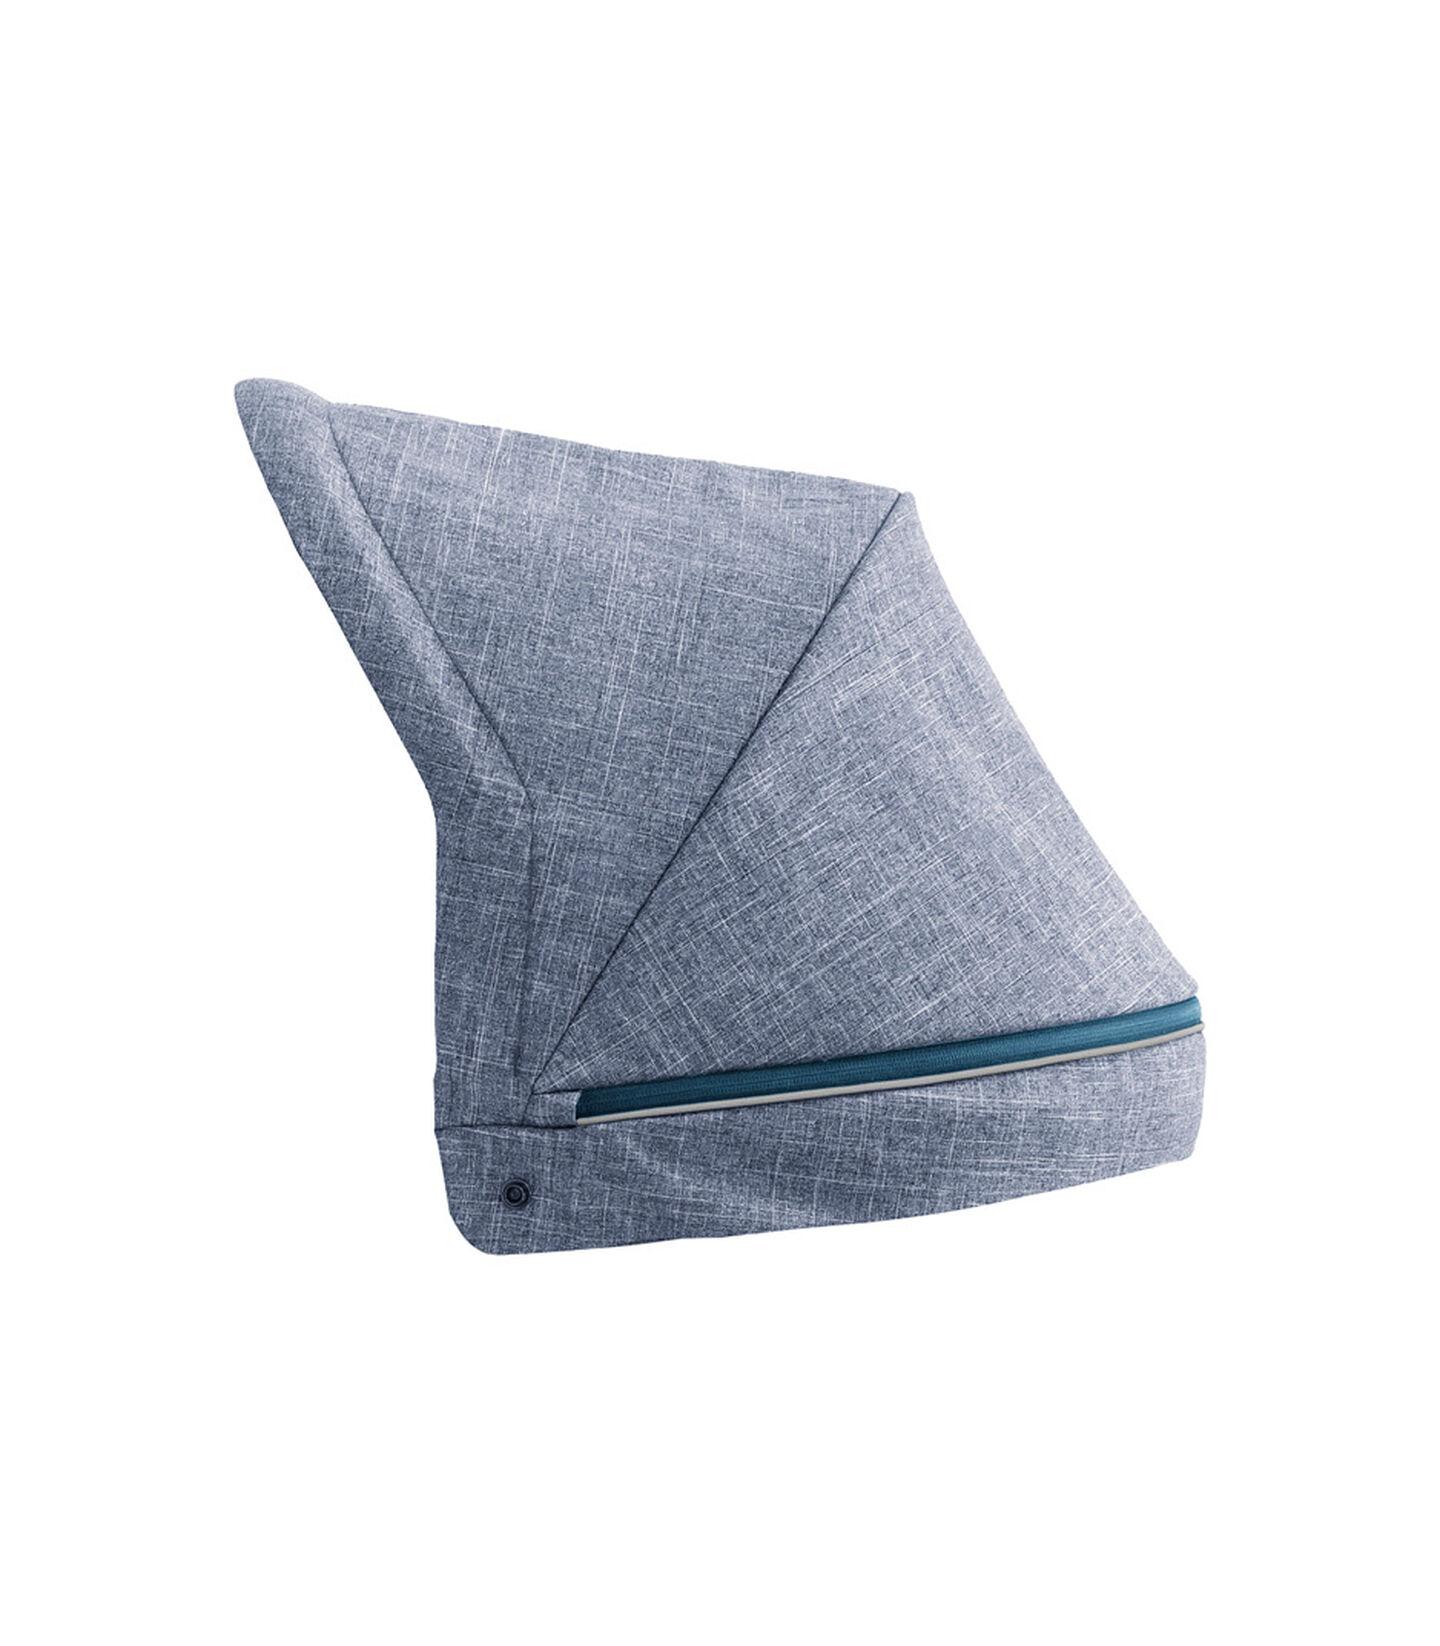 Stokke® Beat Canopy Blue Melange, Bleu mélange, mainview view 1